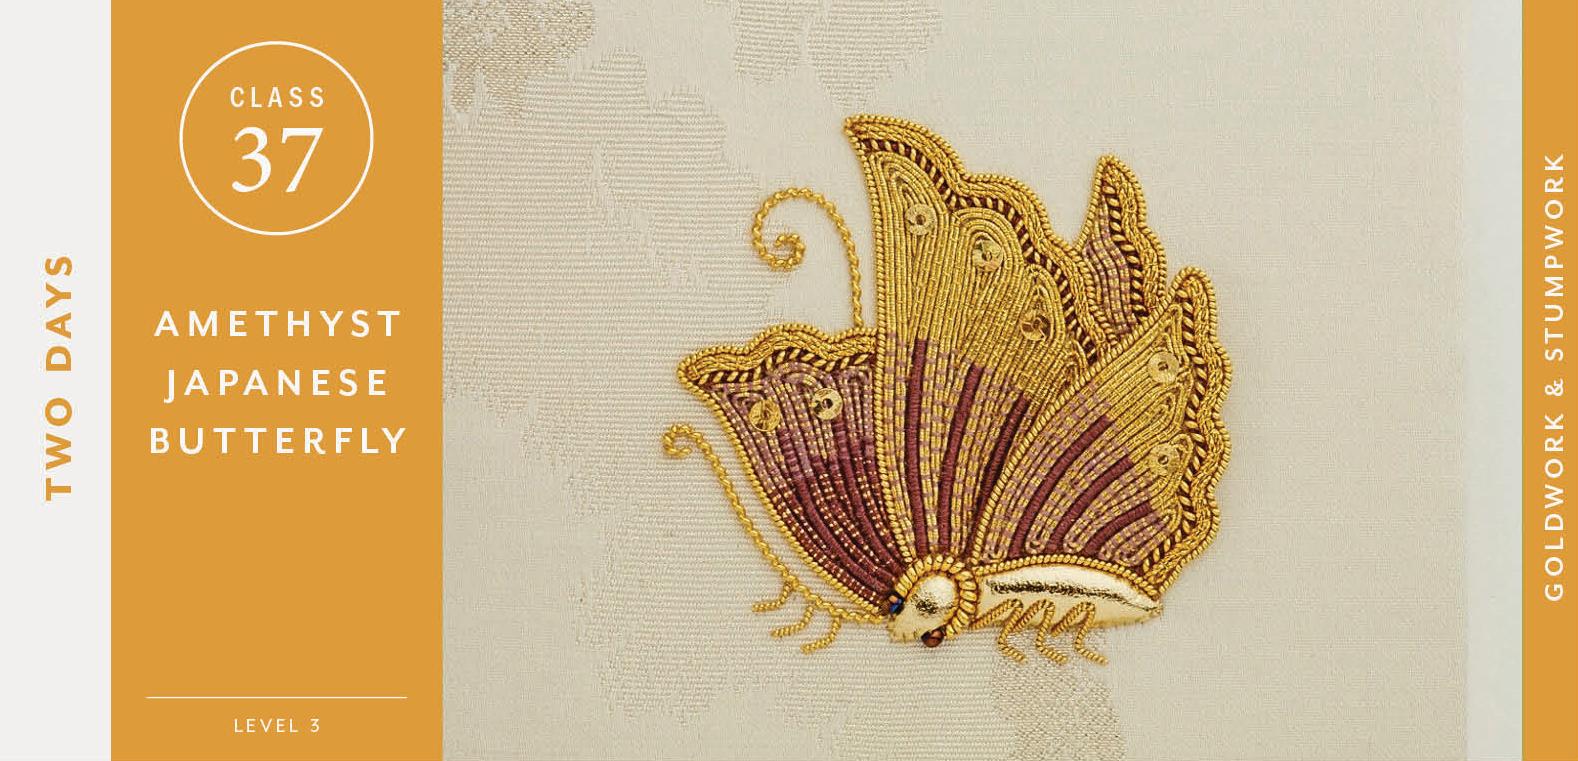 batb2020-nicholas-j-promo-butterfly.png